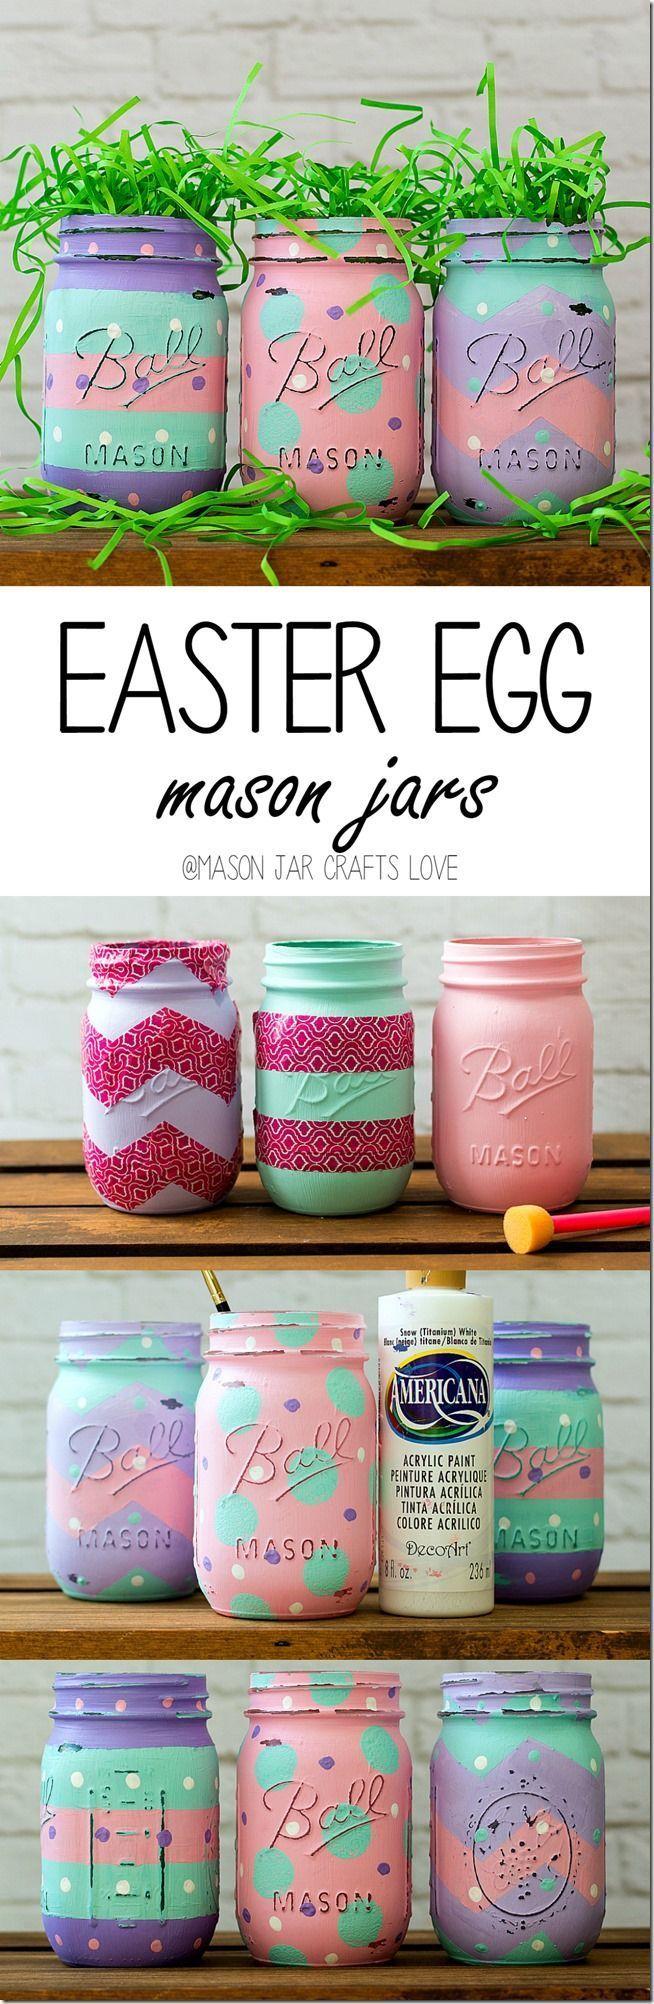 Mason Jar Projects Best 20 Mason Jar Crafts Ideas On Pinterest Mason Jar Diy Jar